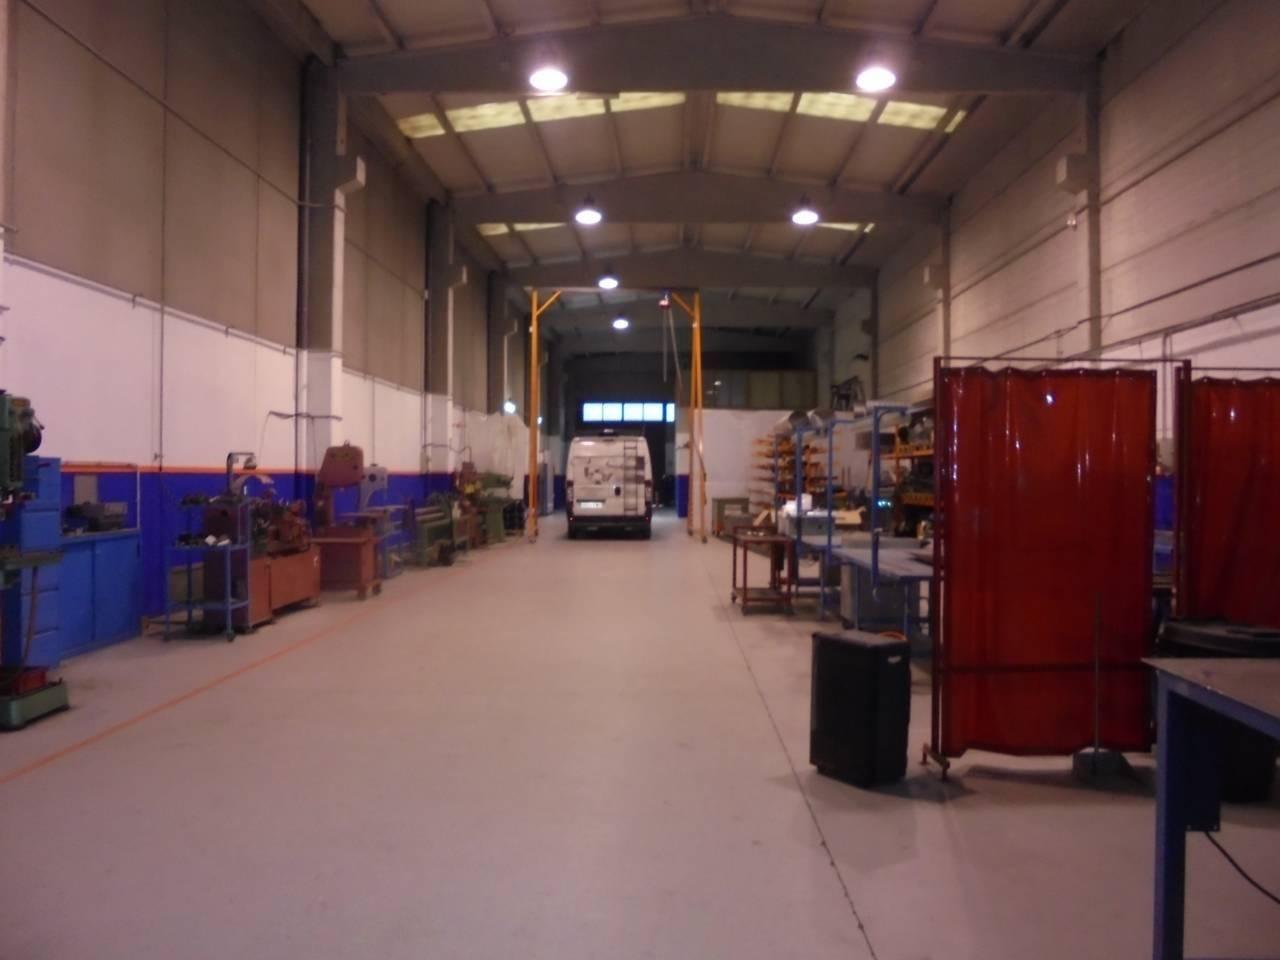 Fabrikhalle  Santa anna iii. Nave industrial de 700 m2., (56x12,5x9 alt.) en un solar de 888